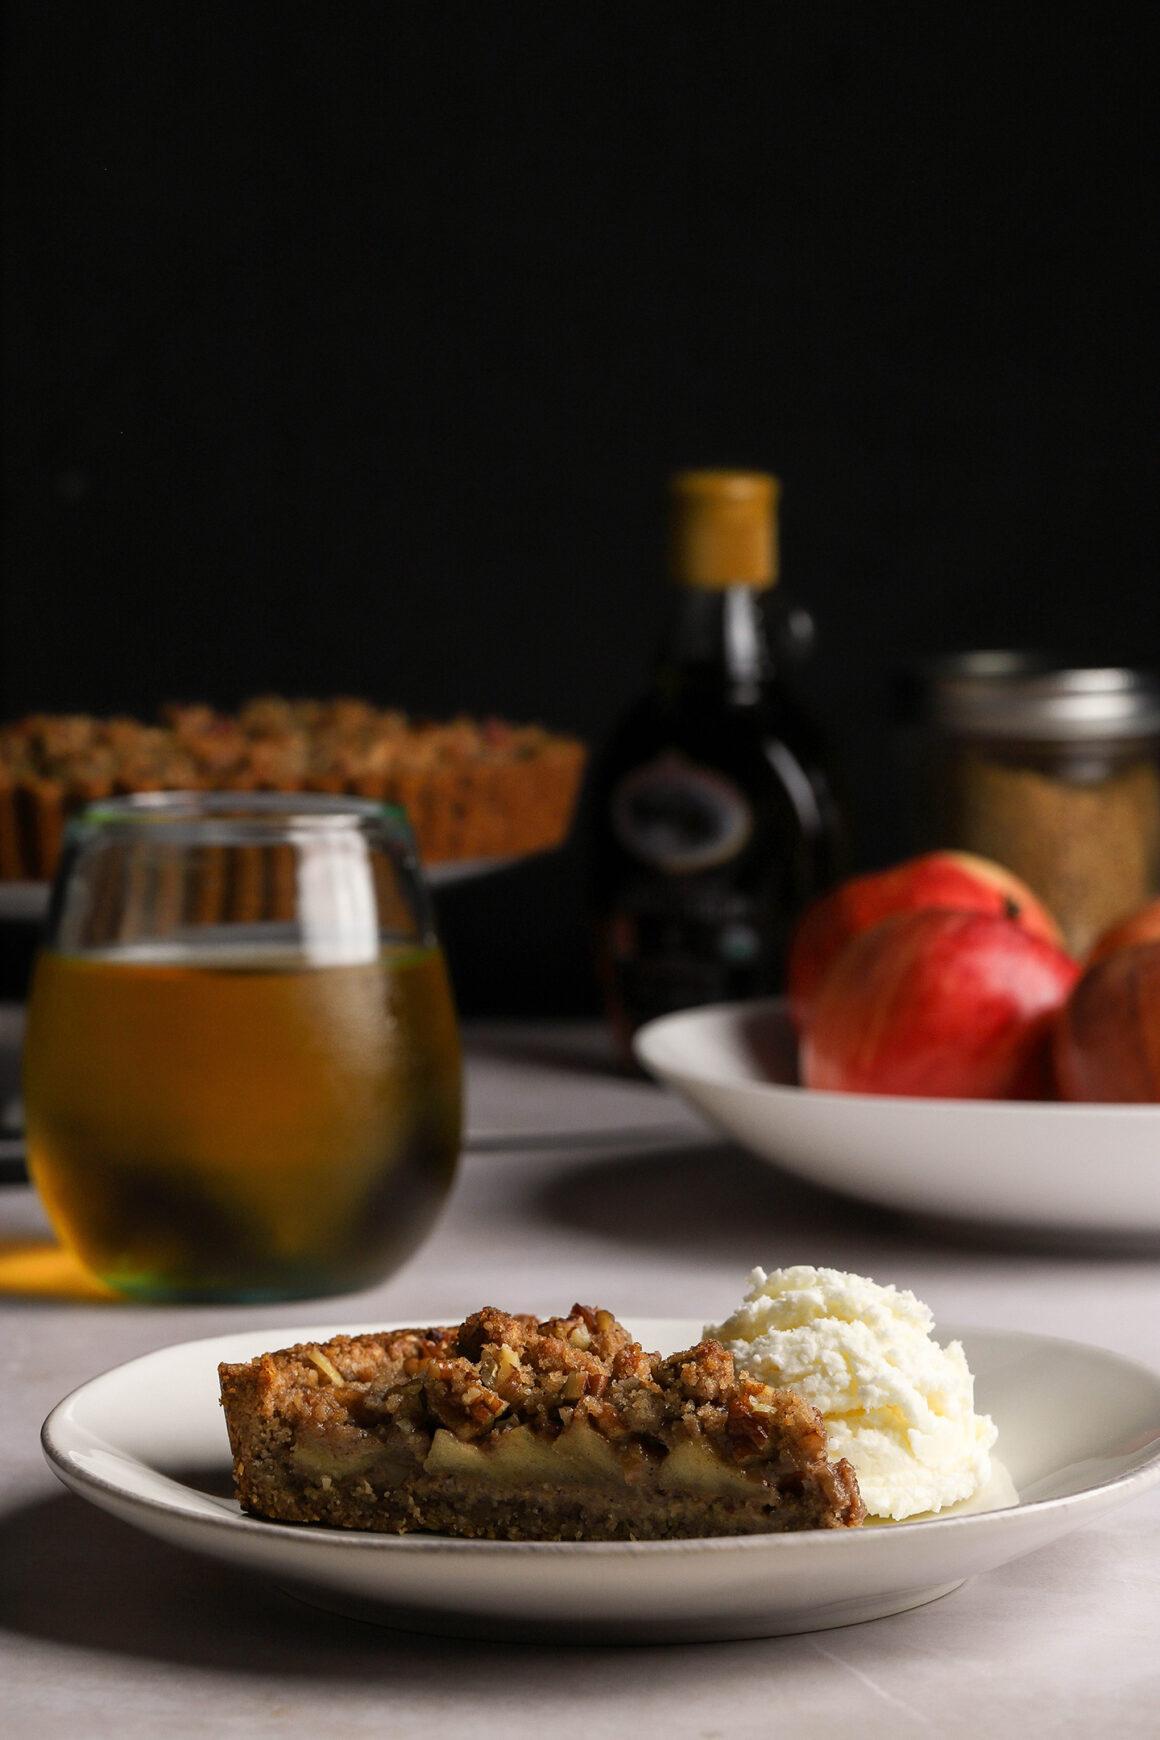 caramel apple pecan tart with whipped cream